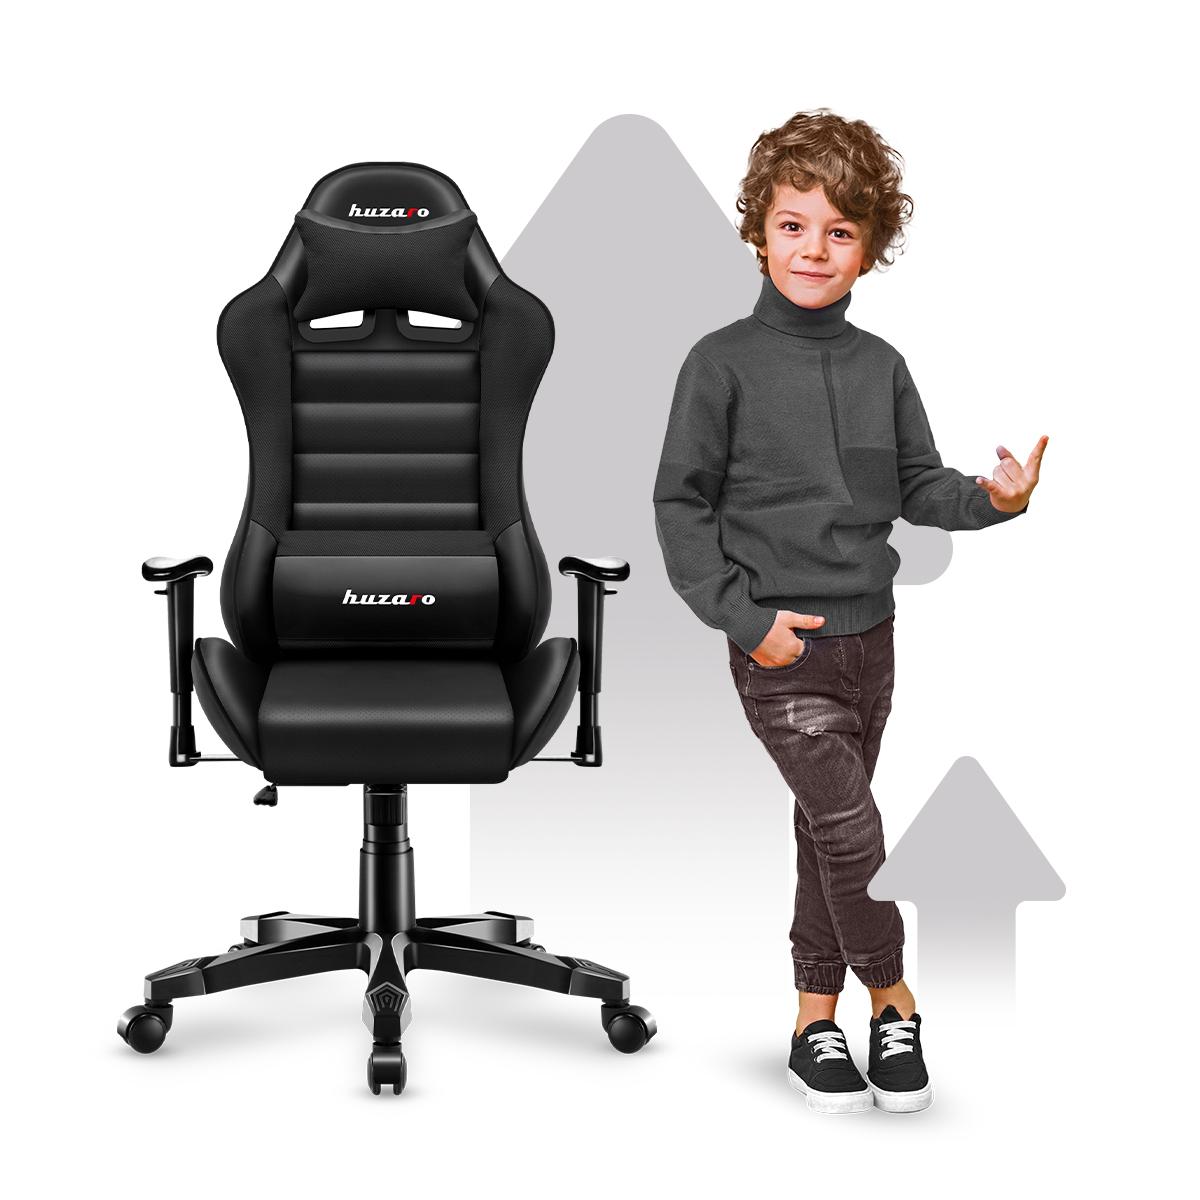 Front fotela Ranger 6.0 Black z dzieckiem